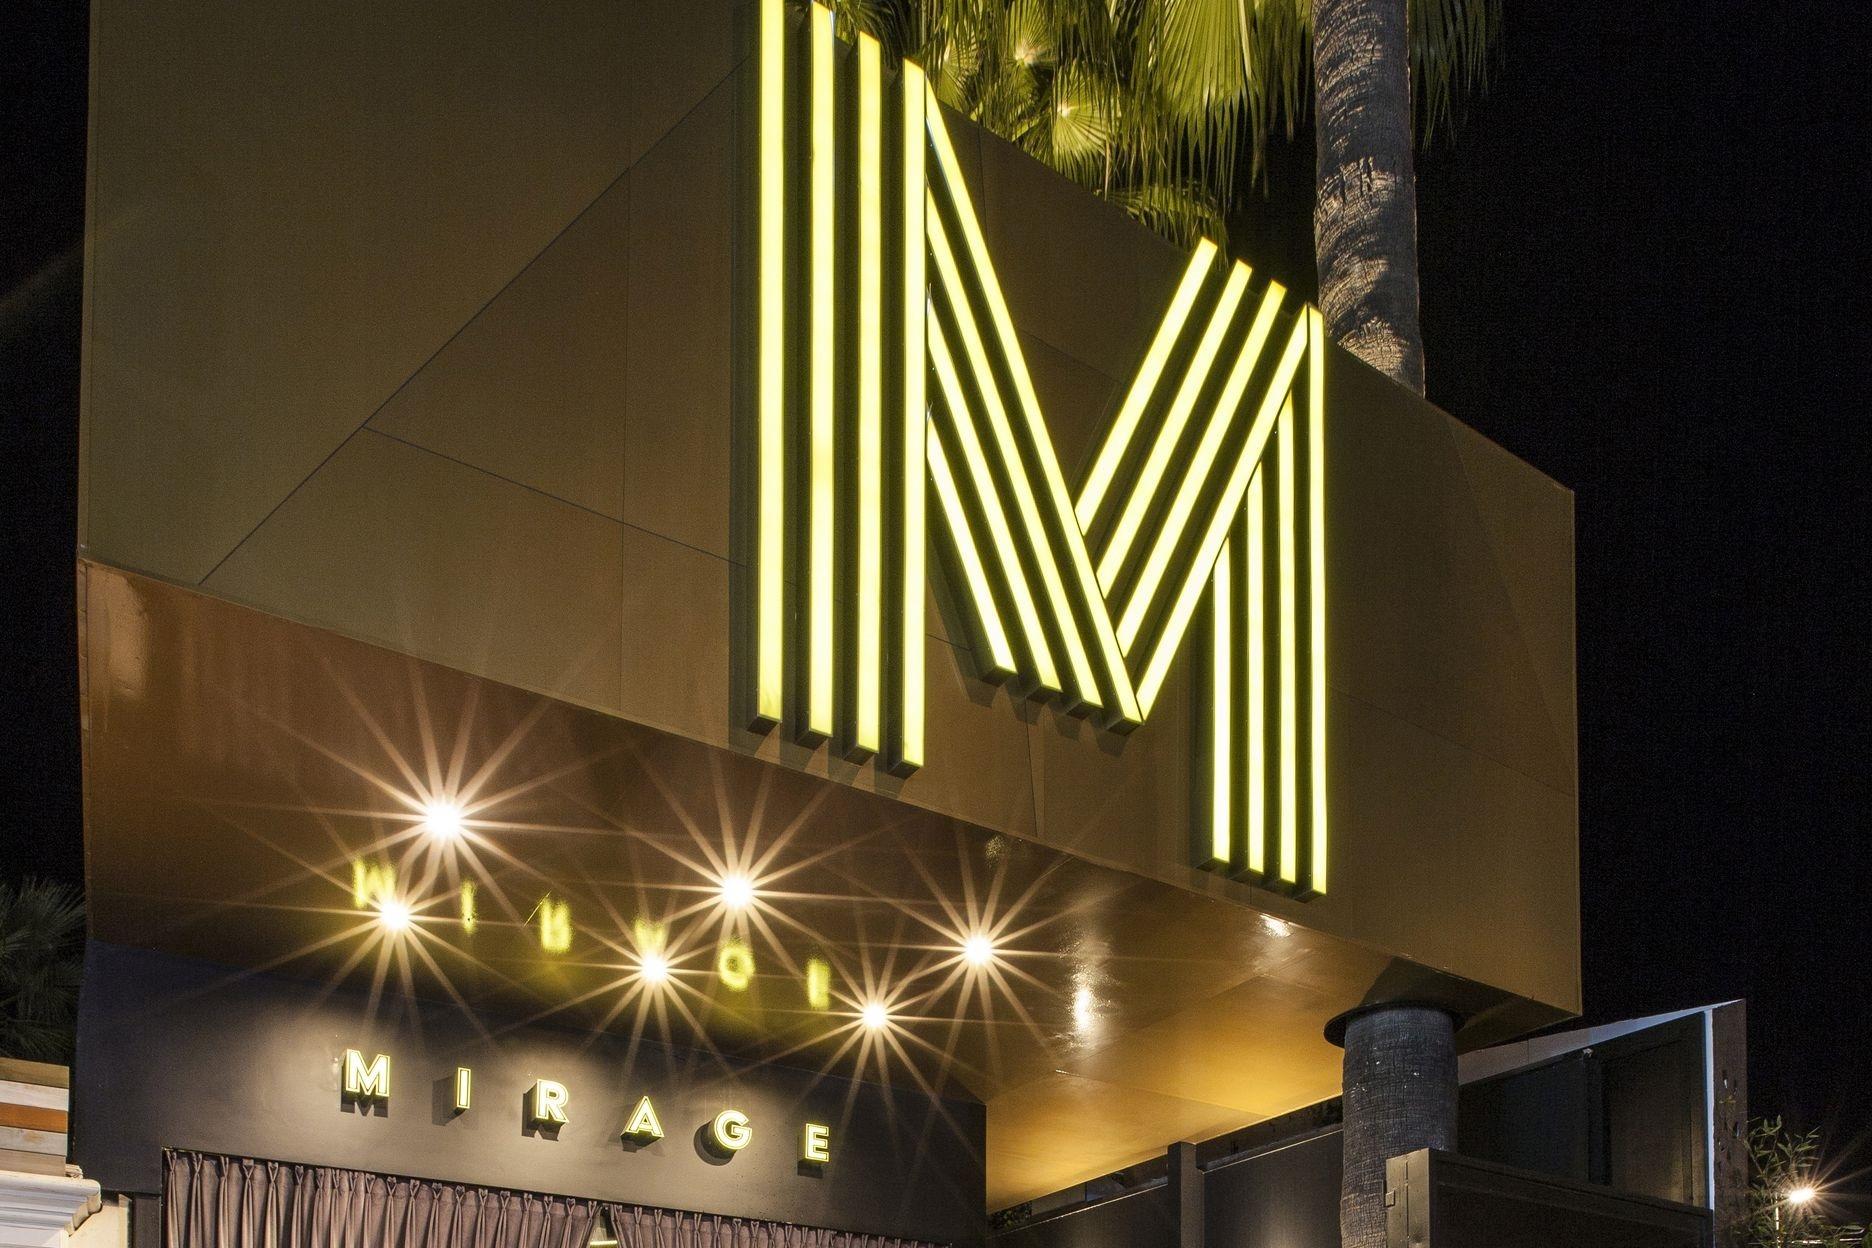 Discoteca Mirage